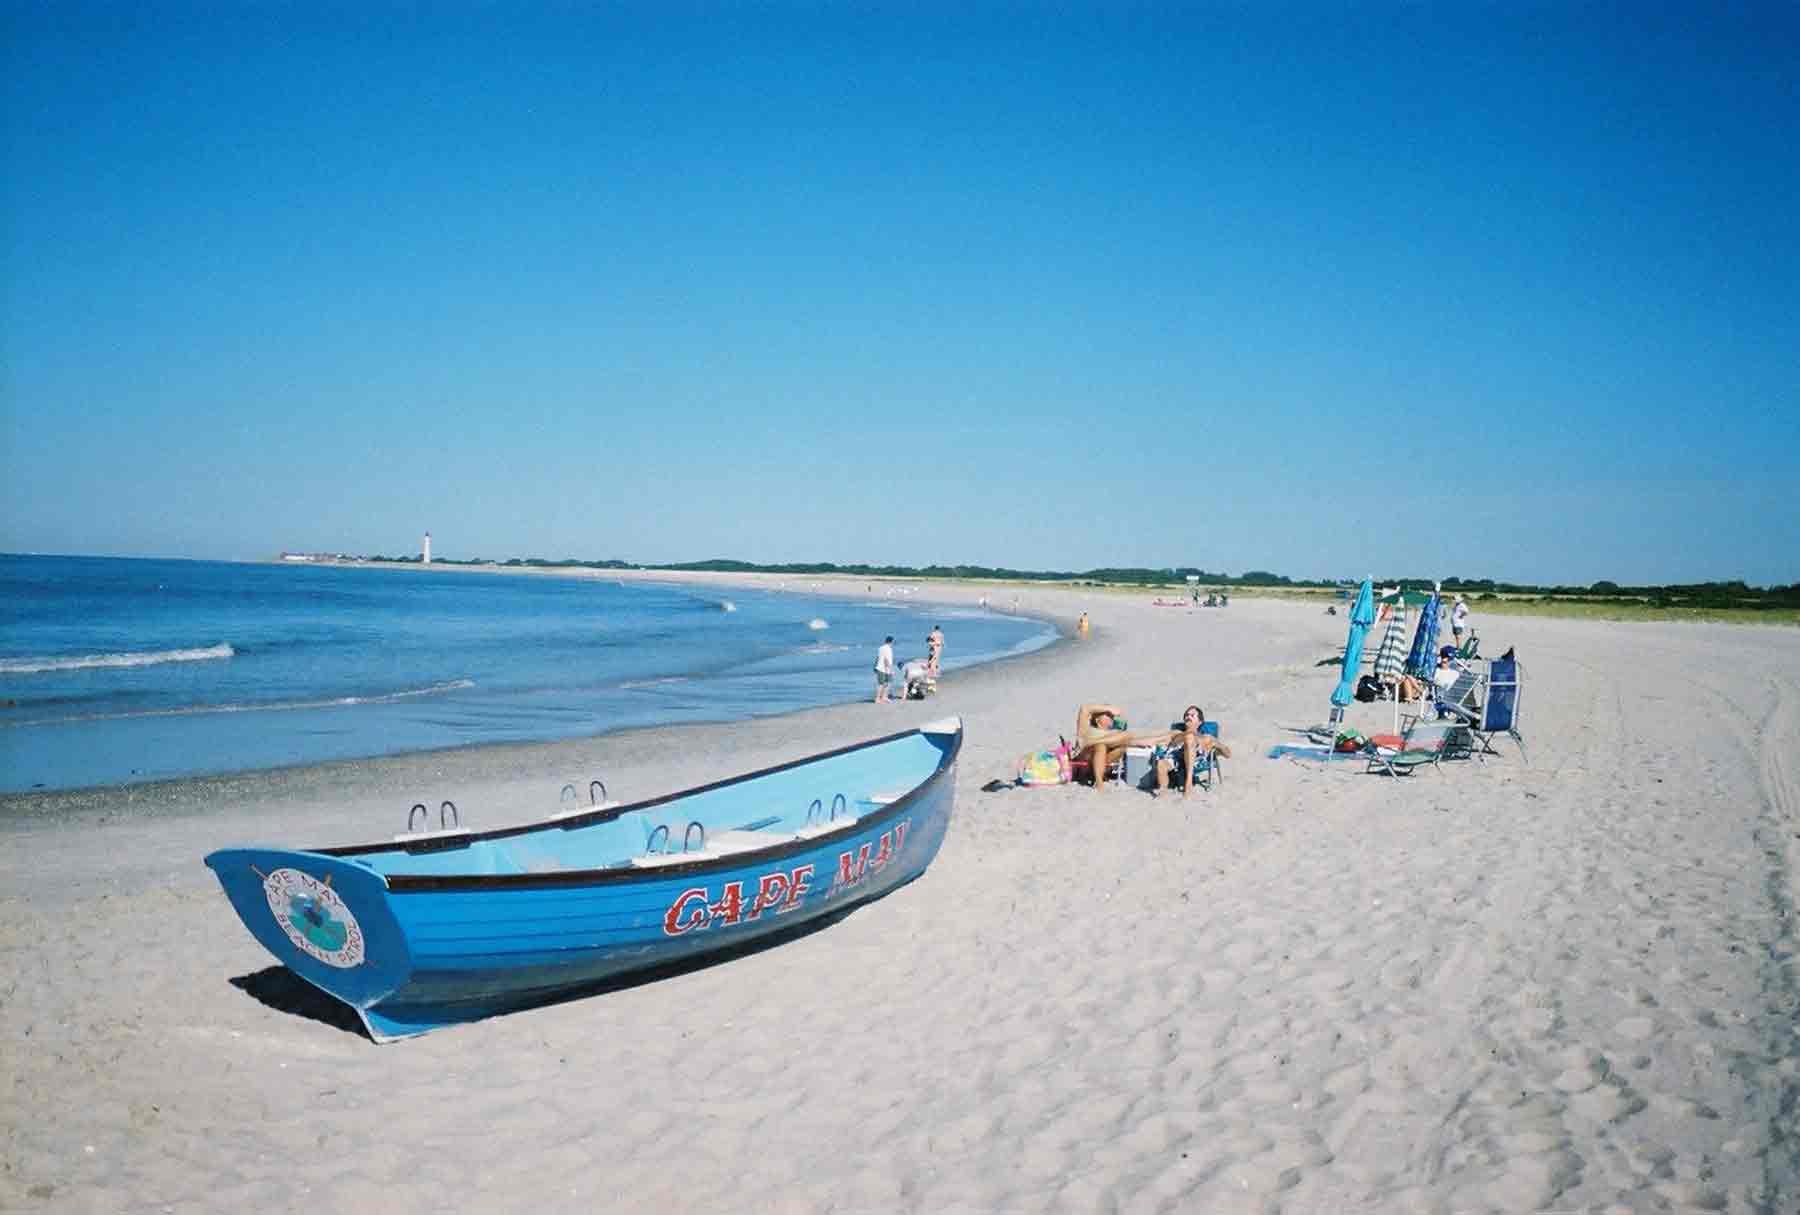 Hd Great White Shark Wallpaper Seagulls Jersey Shore Vacationing Blog